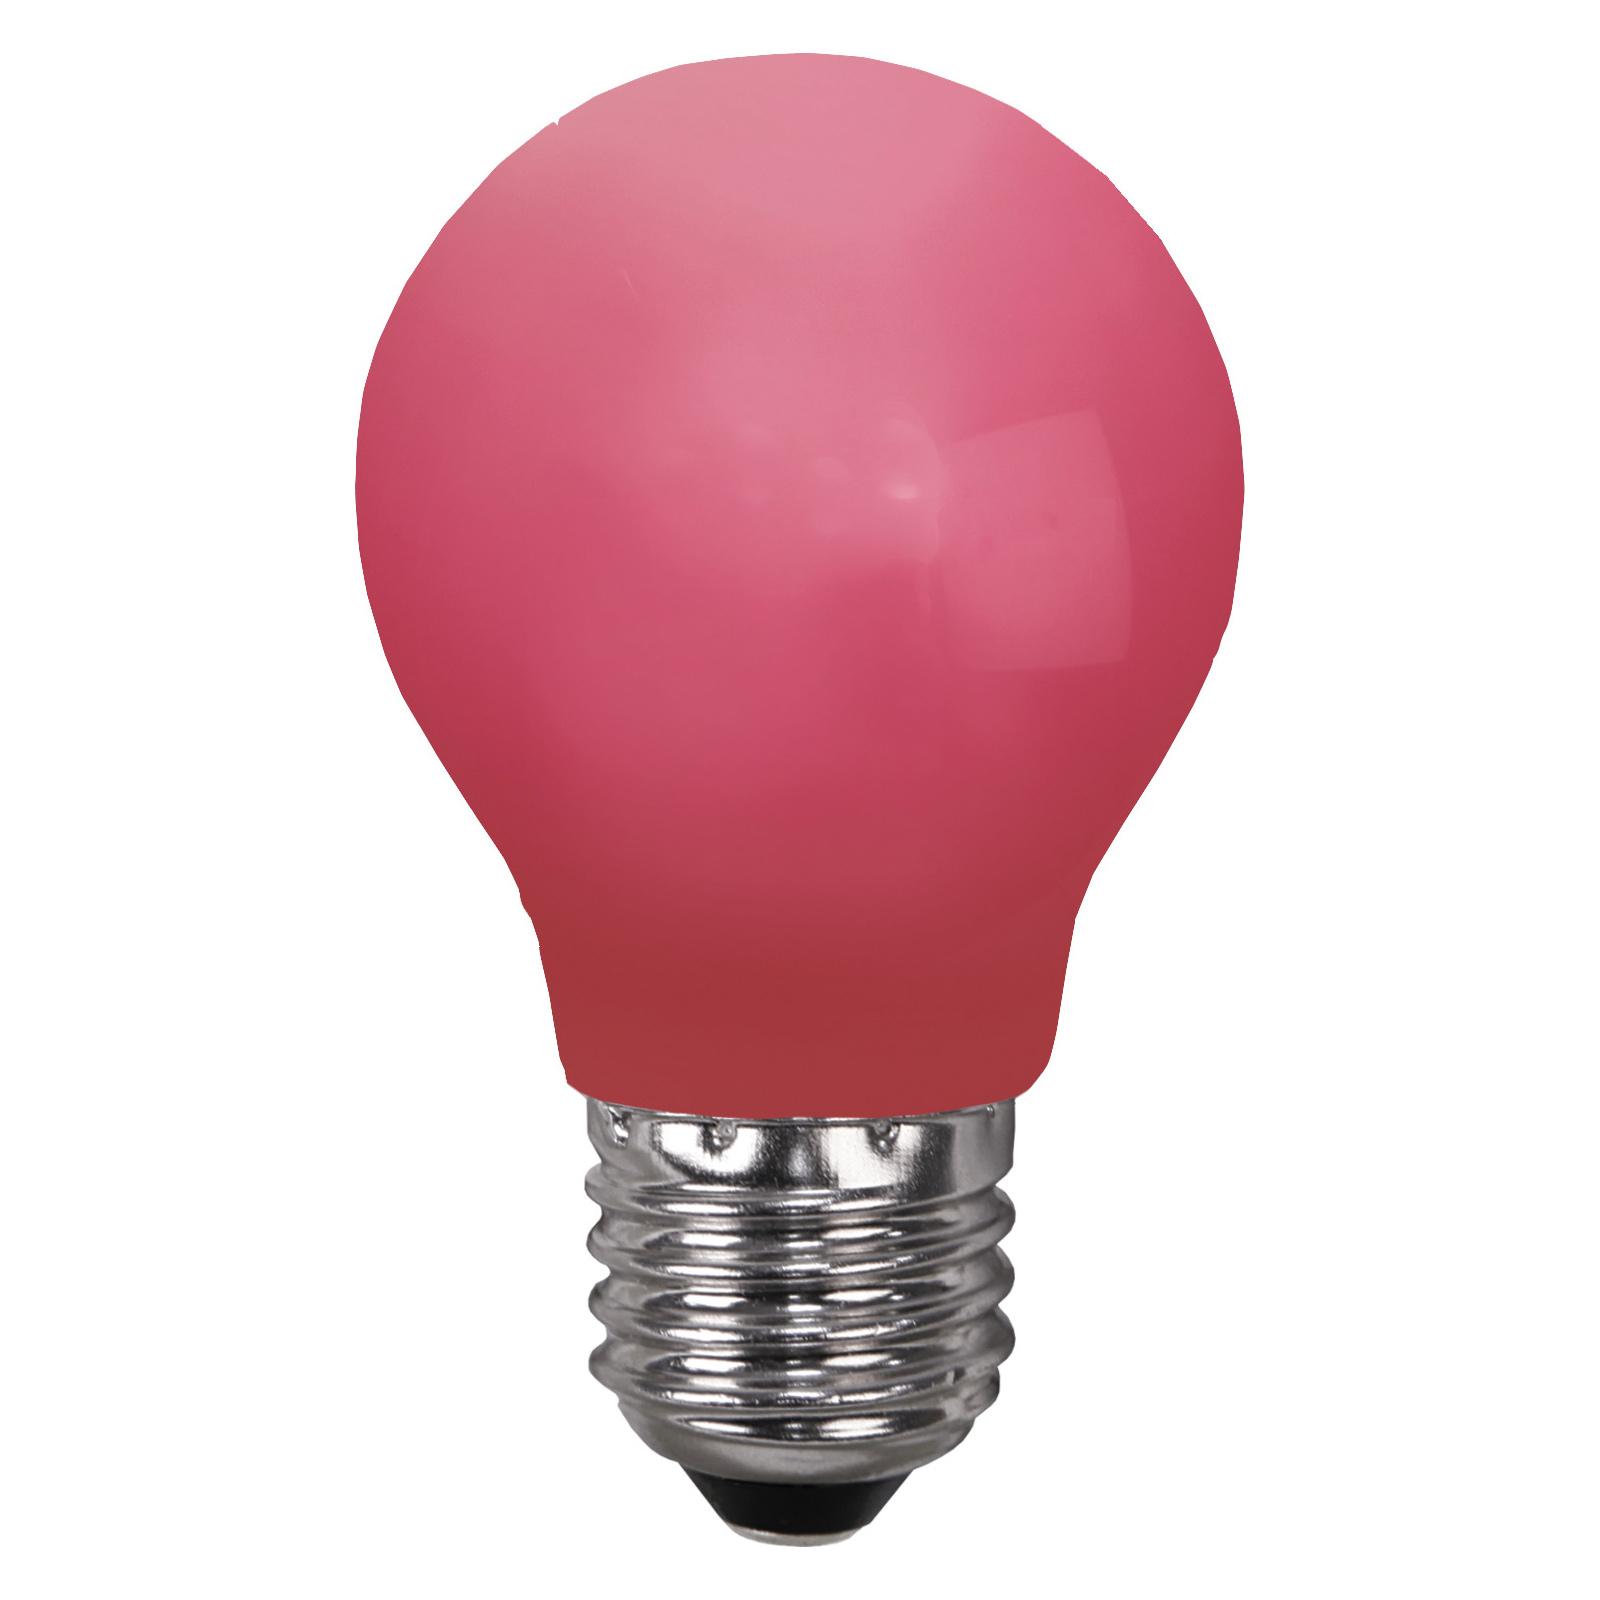 LED-Lampe E27 für Lichterketten, bruchfest, rot